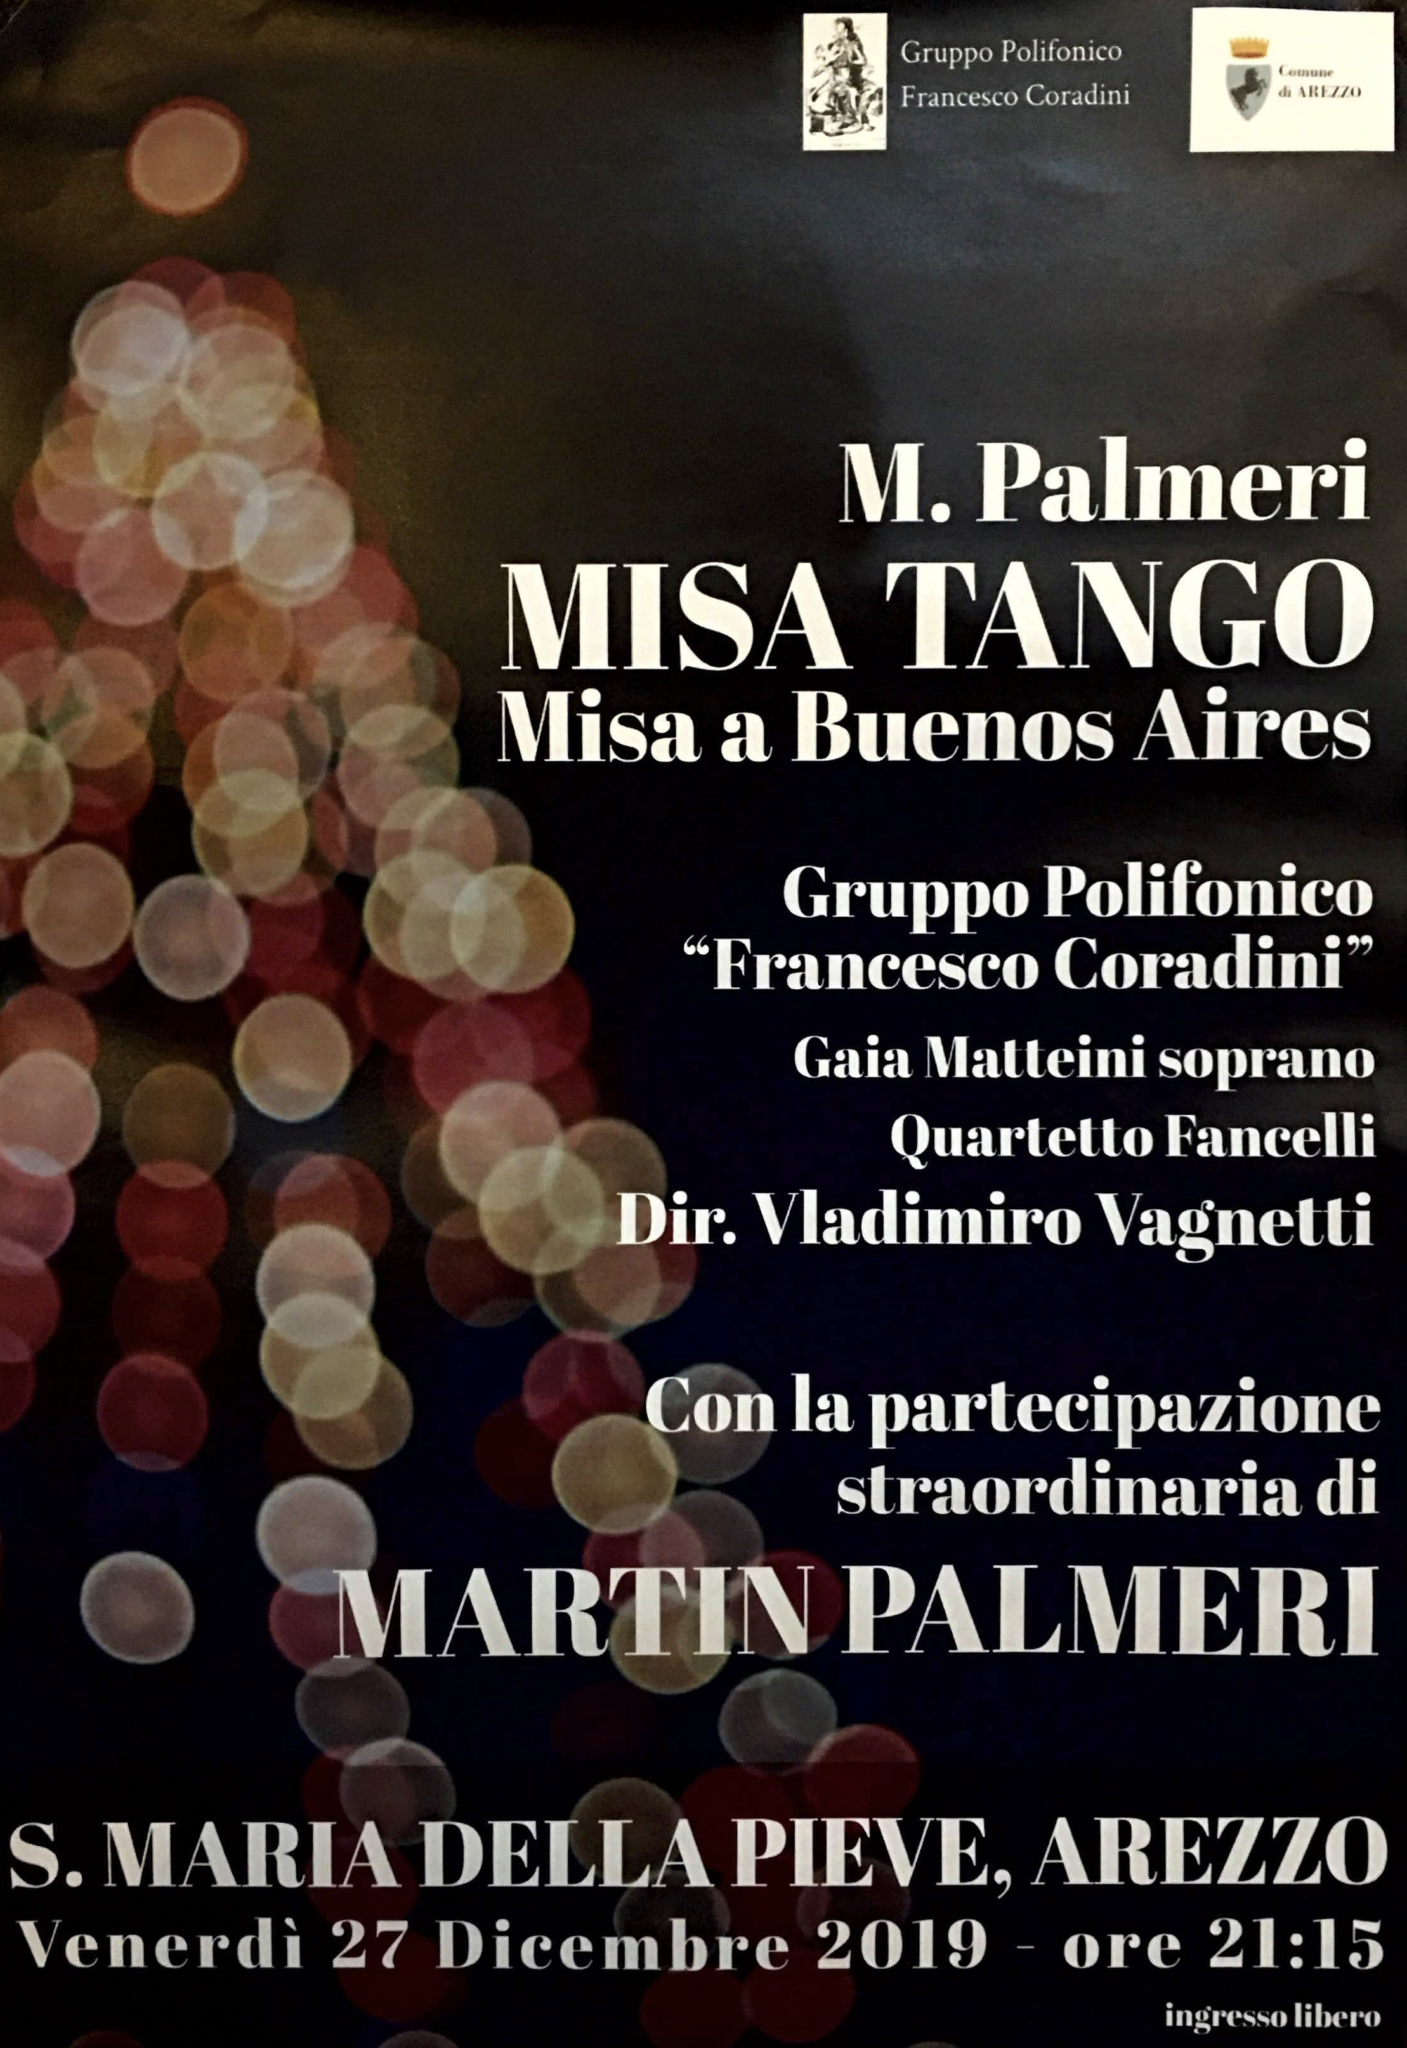 Misa Tango in Pieve ad Arezzo, Associazione Musica Antiqua Rigutino